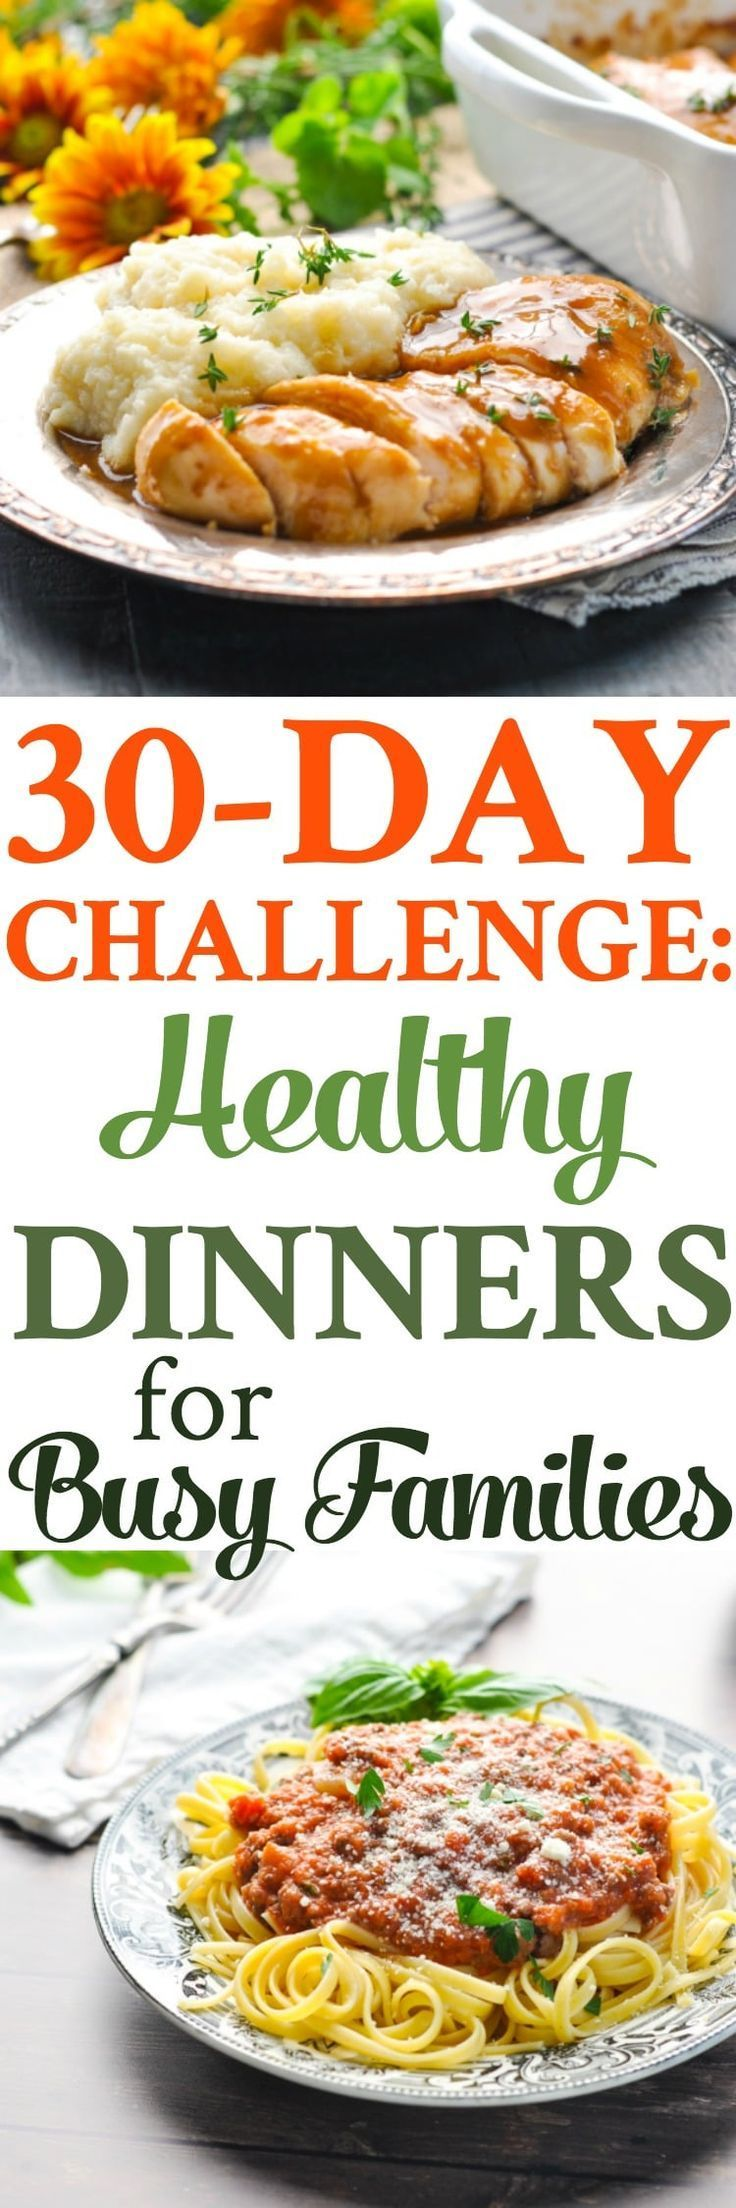 #30tagechallenge #tagechallenge #dinnerideen #gesunde30-Tage-Challenge: Gesunde Dinner-Ideen! -